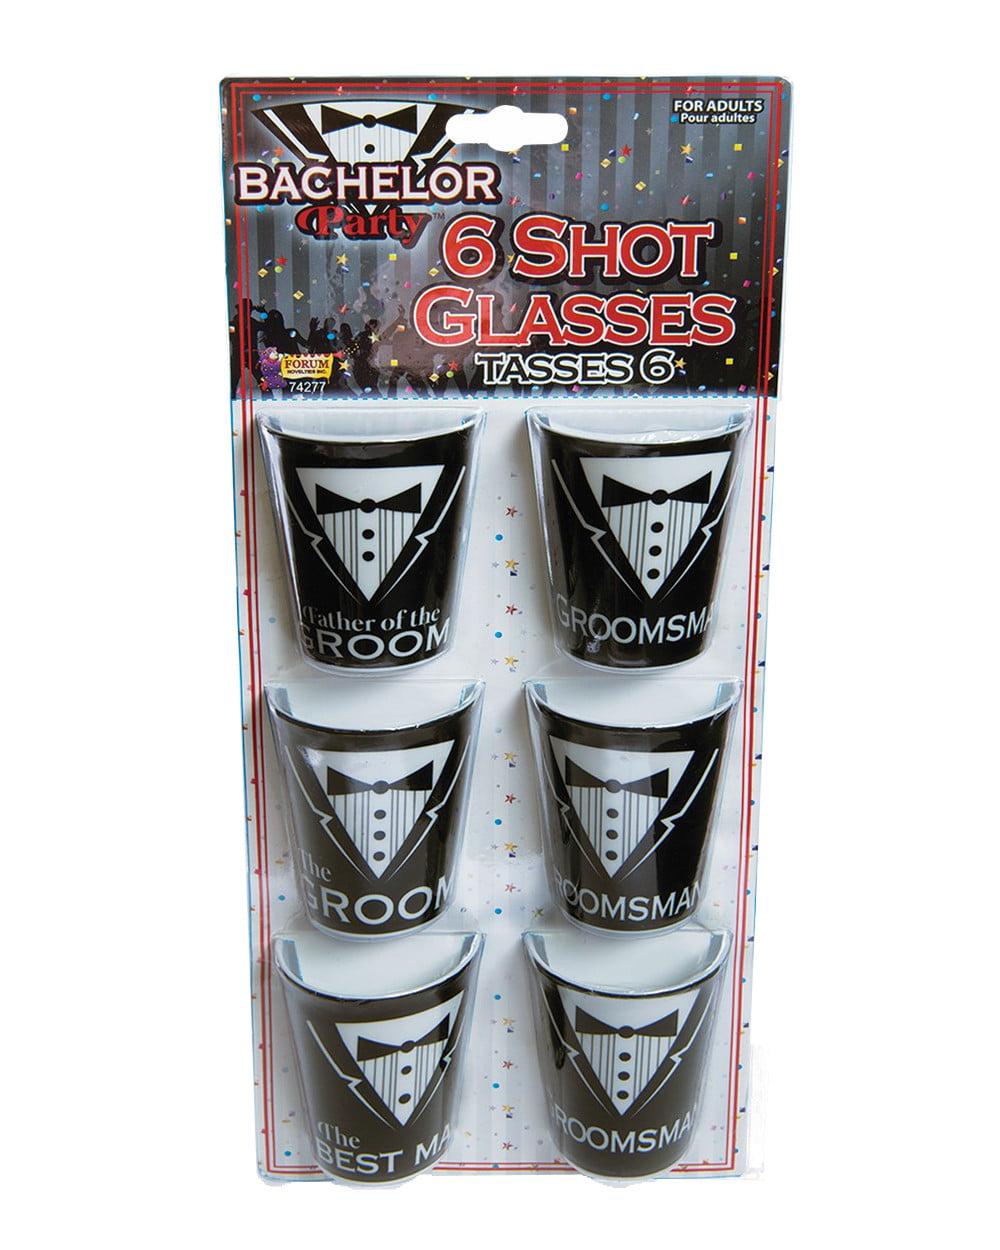 Adult's Mens Bachelor Party 6 Piece Novelty Shot Glass Set Costume Accessory by Forum Novelties